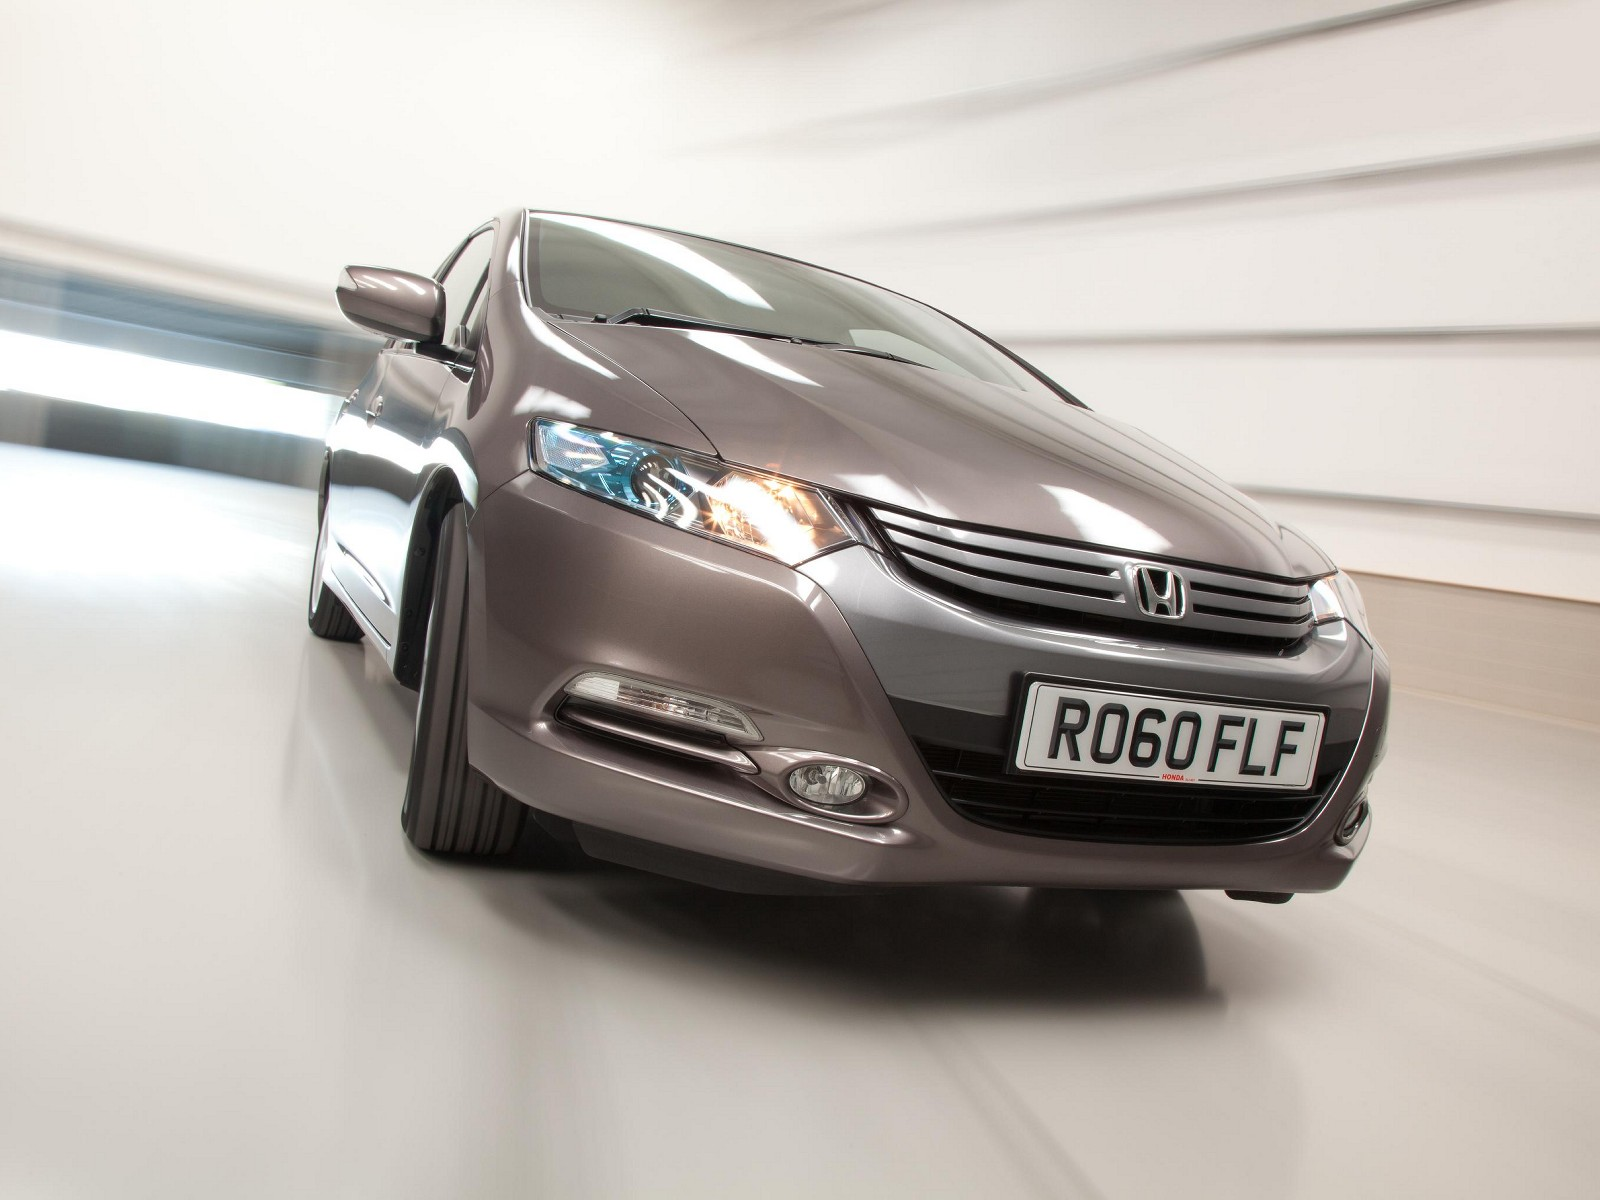 Honda Civic Ima Es 4 Door Saloon Hybrid Electric In Aluminium Silver